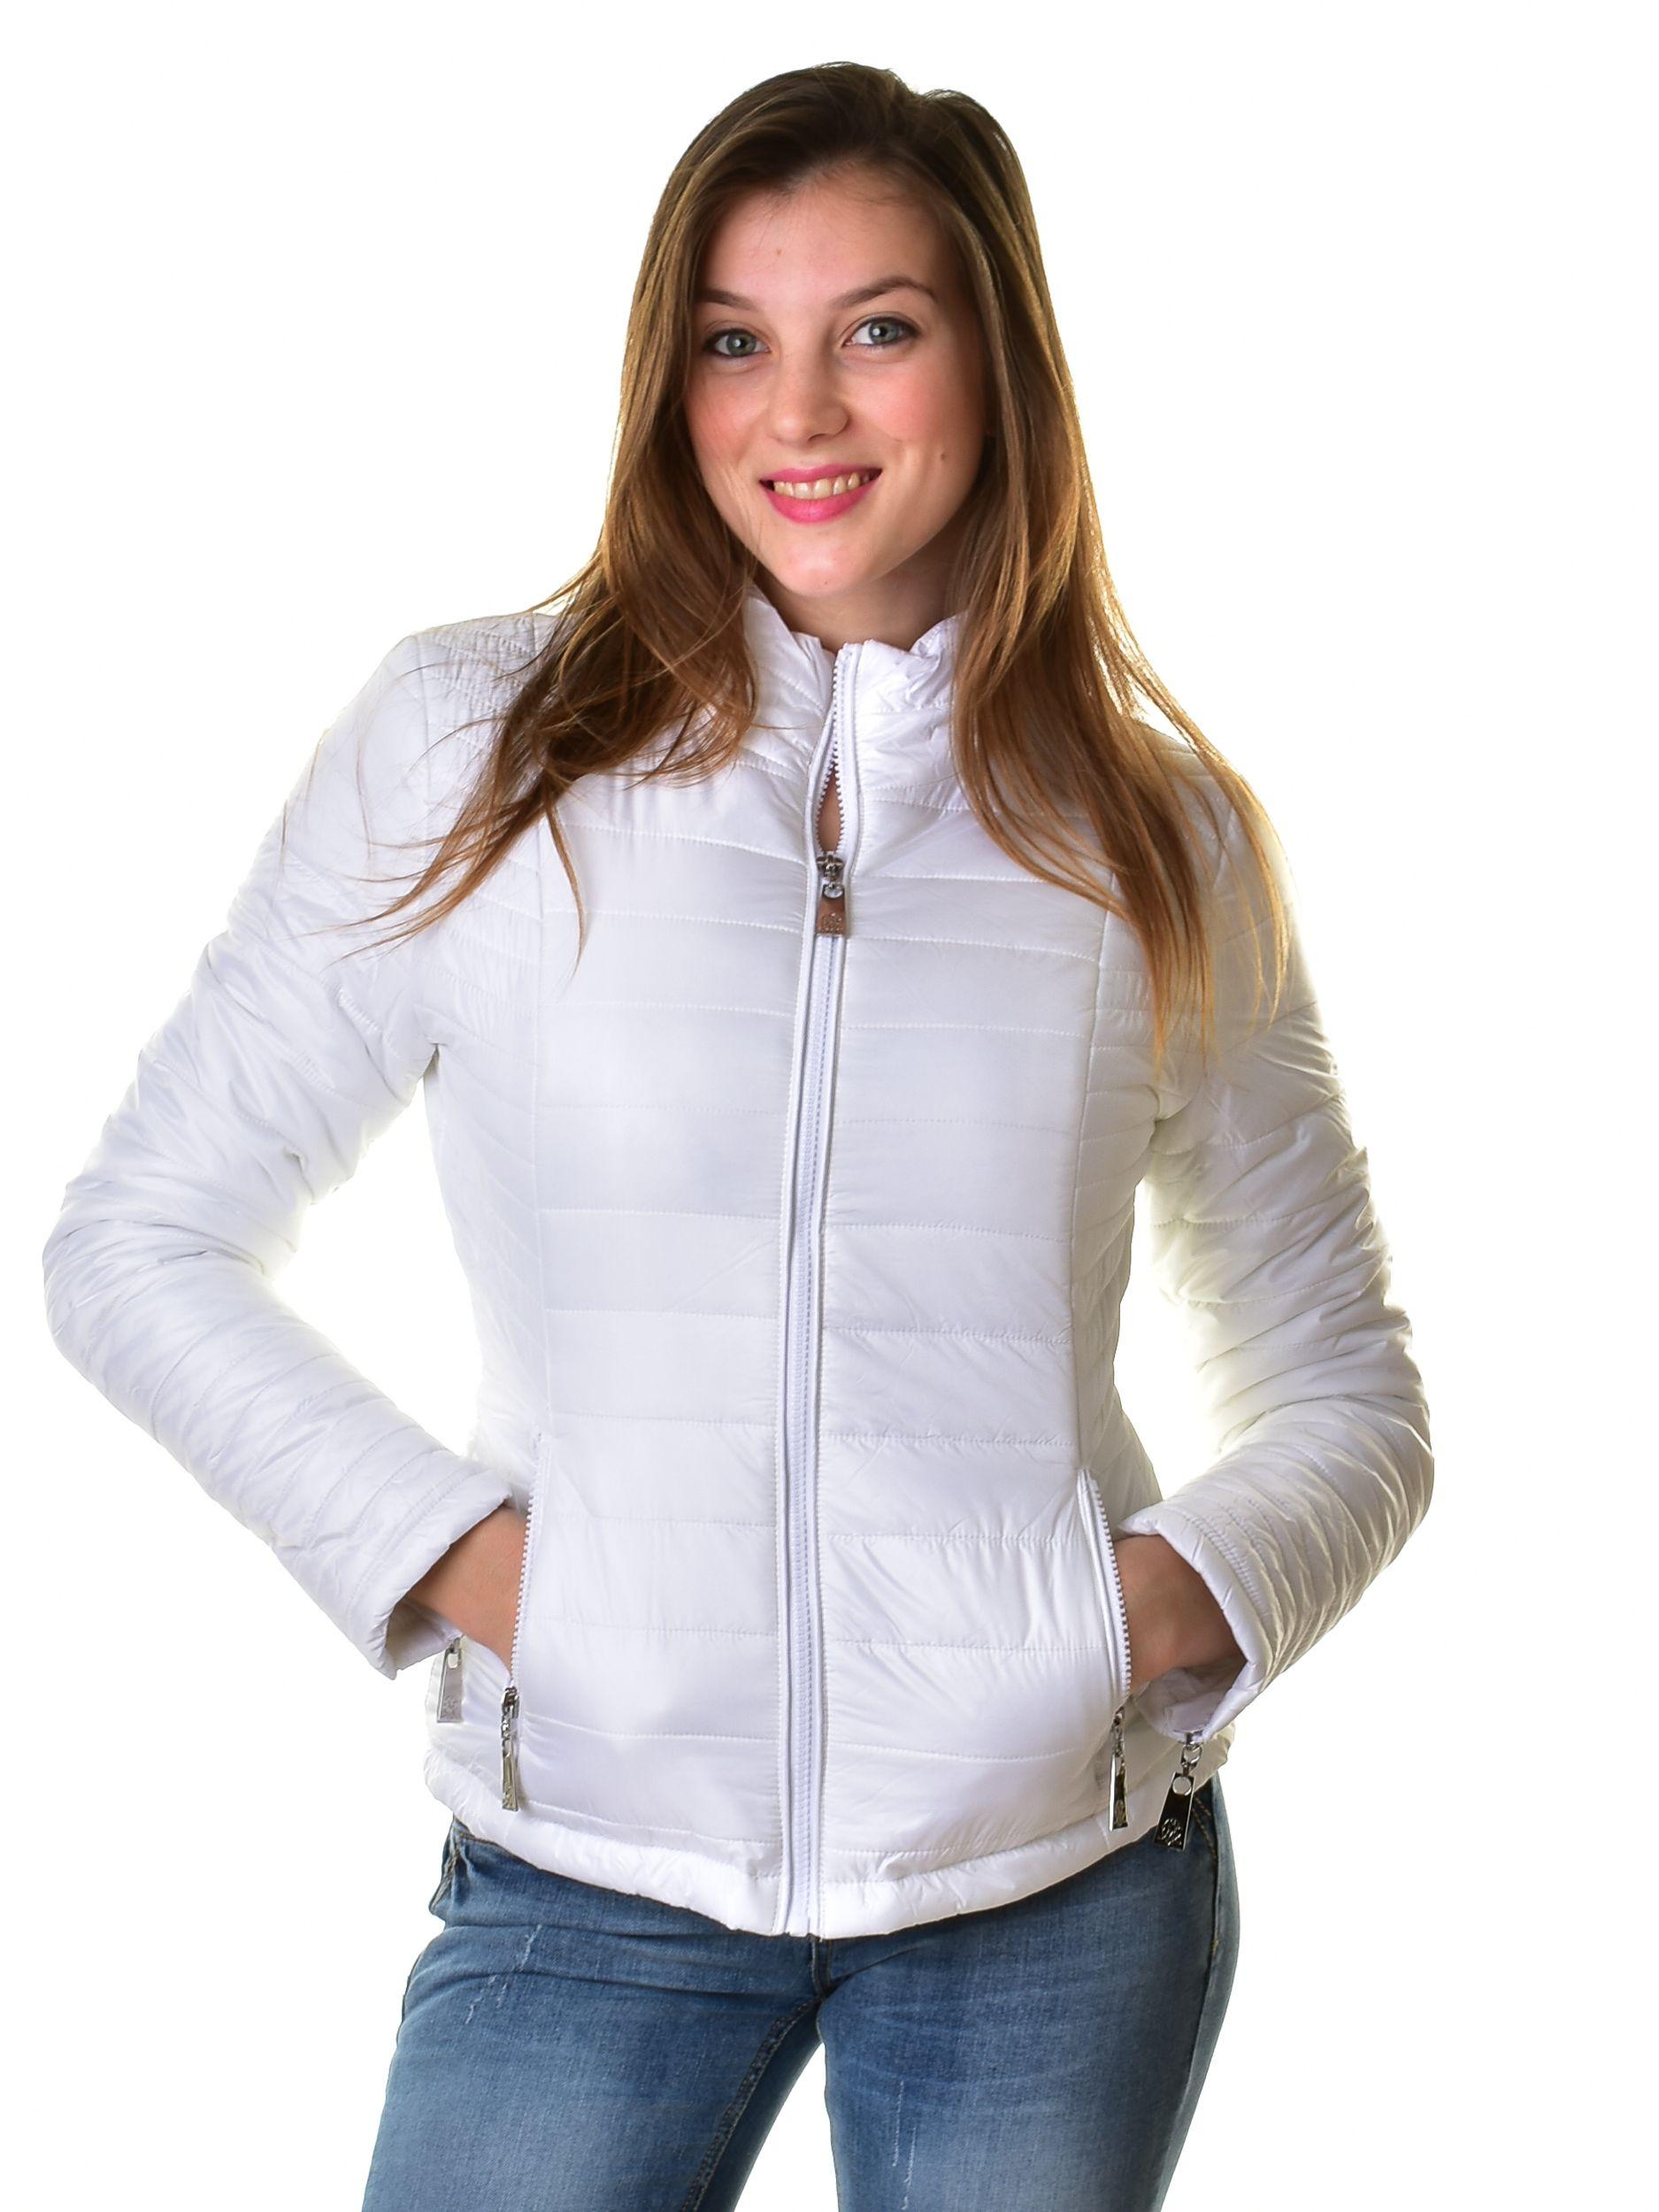 8f1cc9dc56 Mayo Chix női átmeneti kabát STALK | Markasbolt.hu Hivatalos Mayo ...